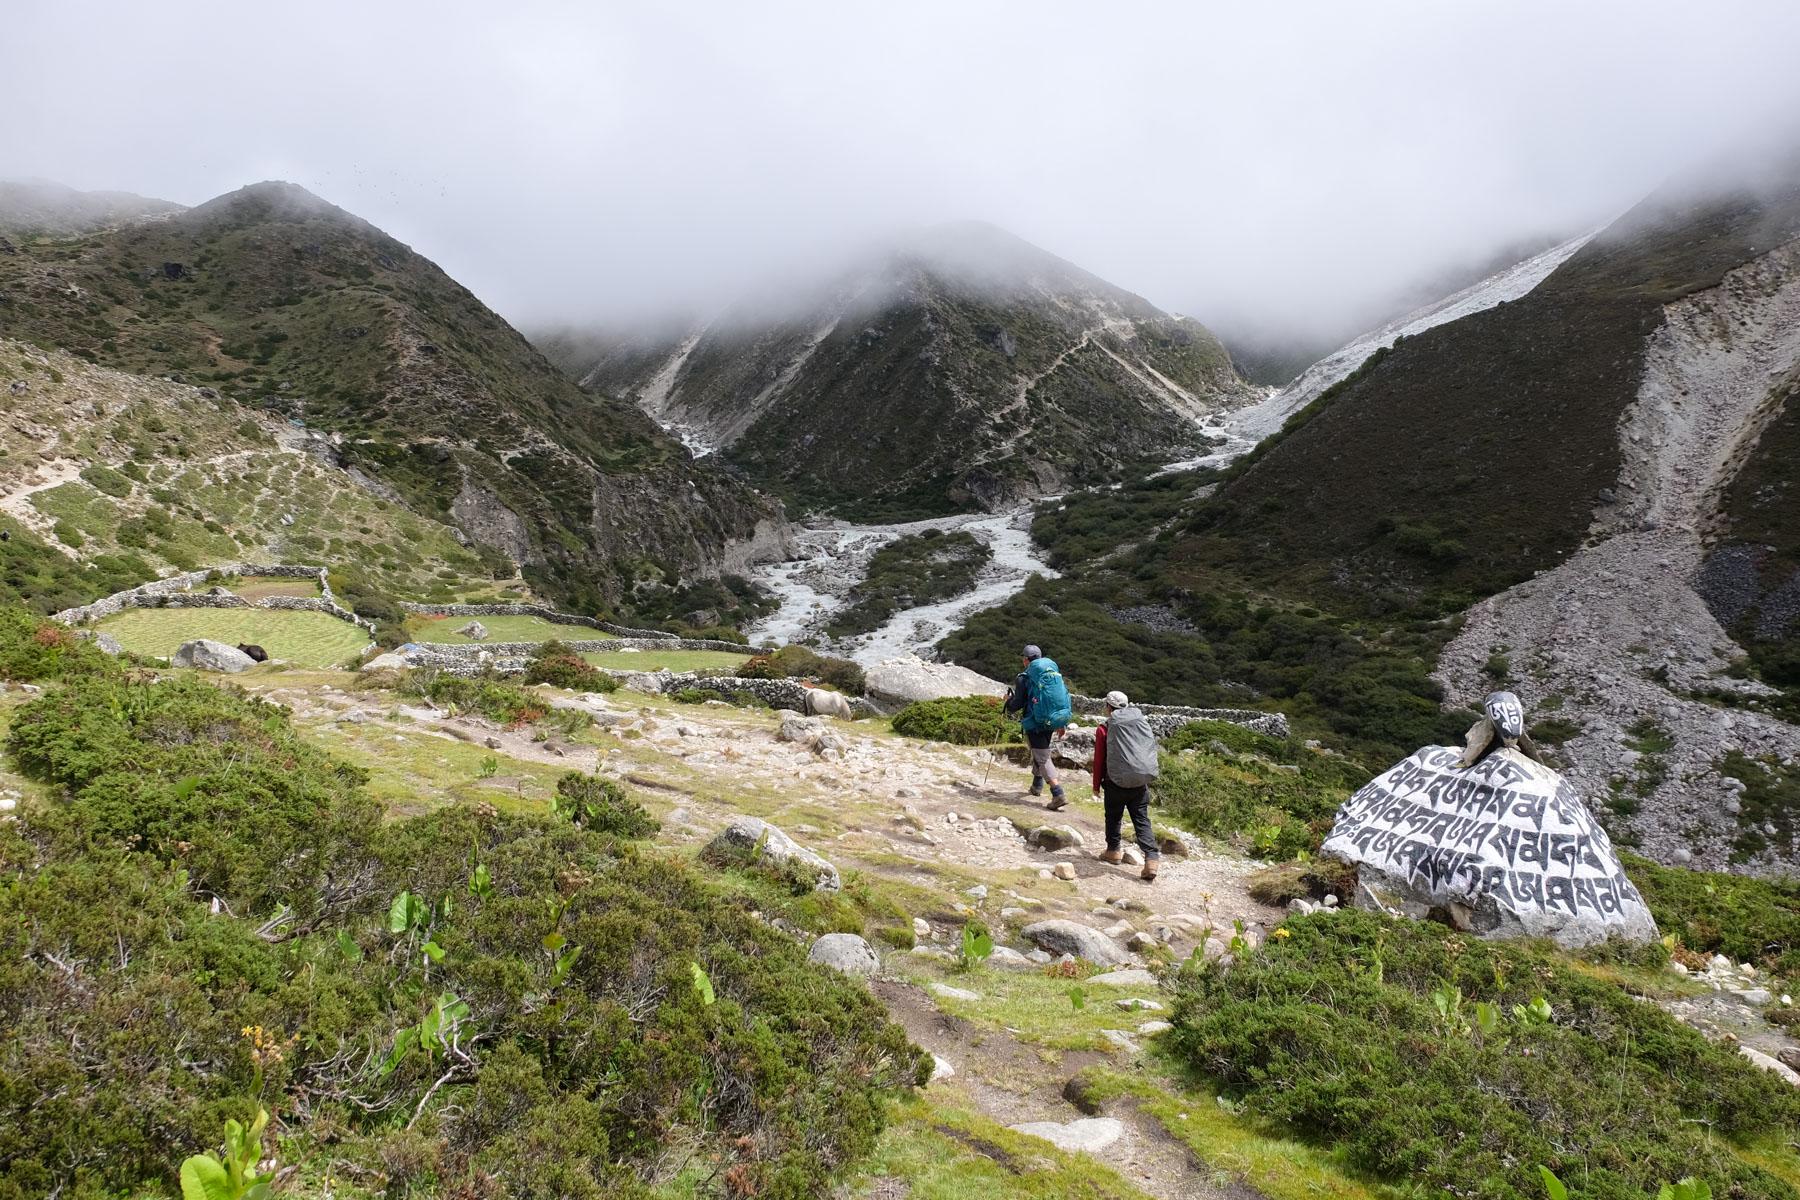 Everest Base Camp, Everest 3 pass #2 17